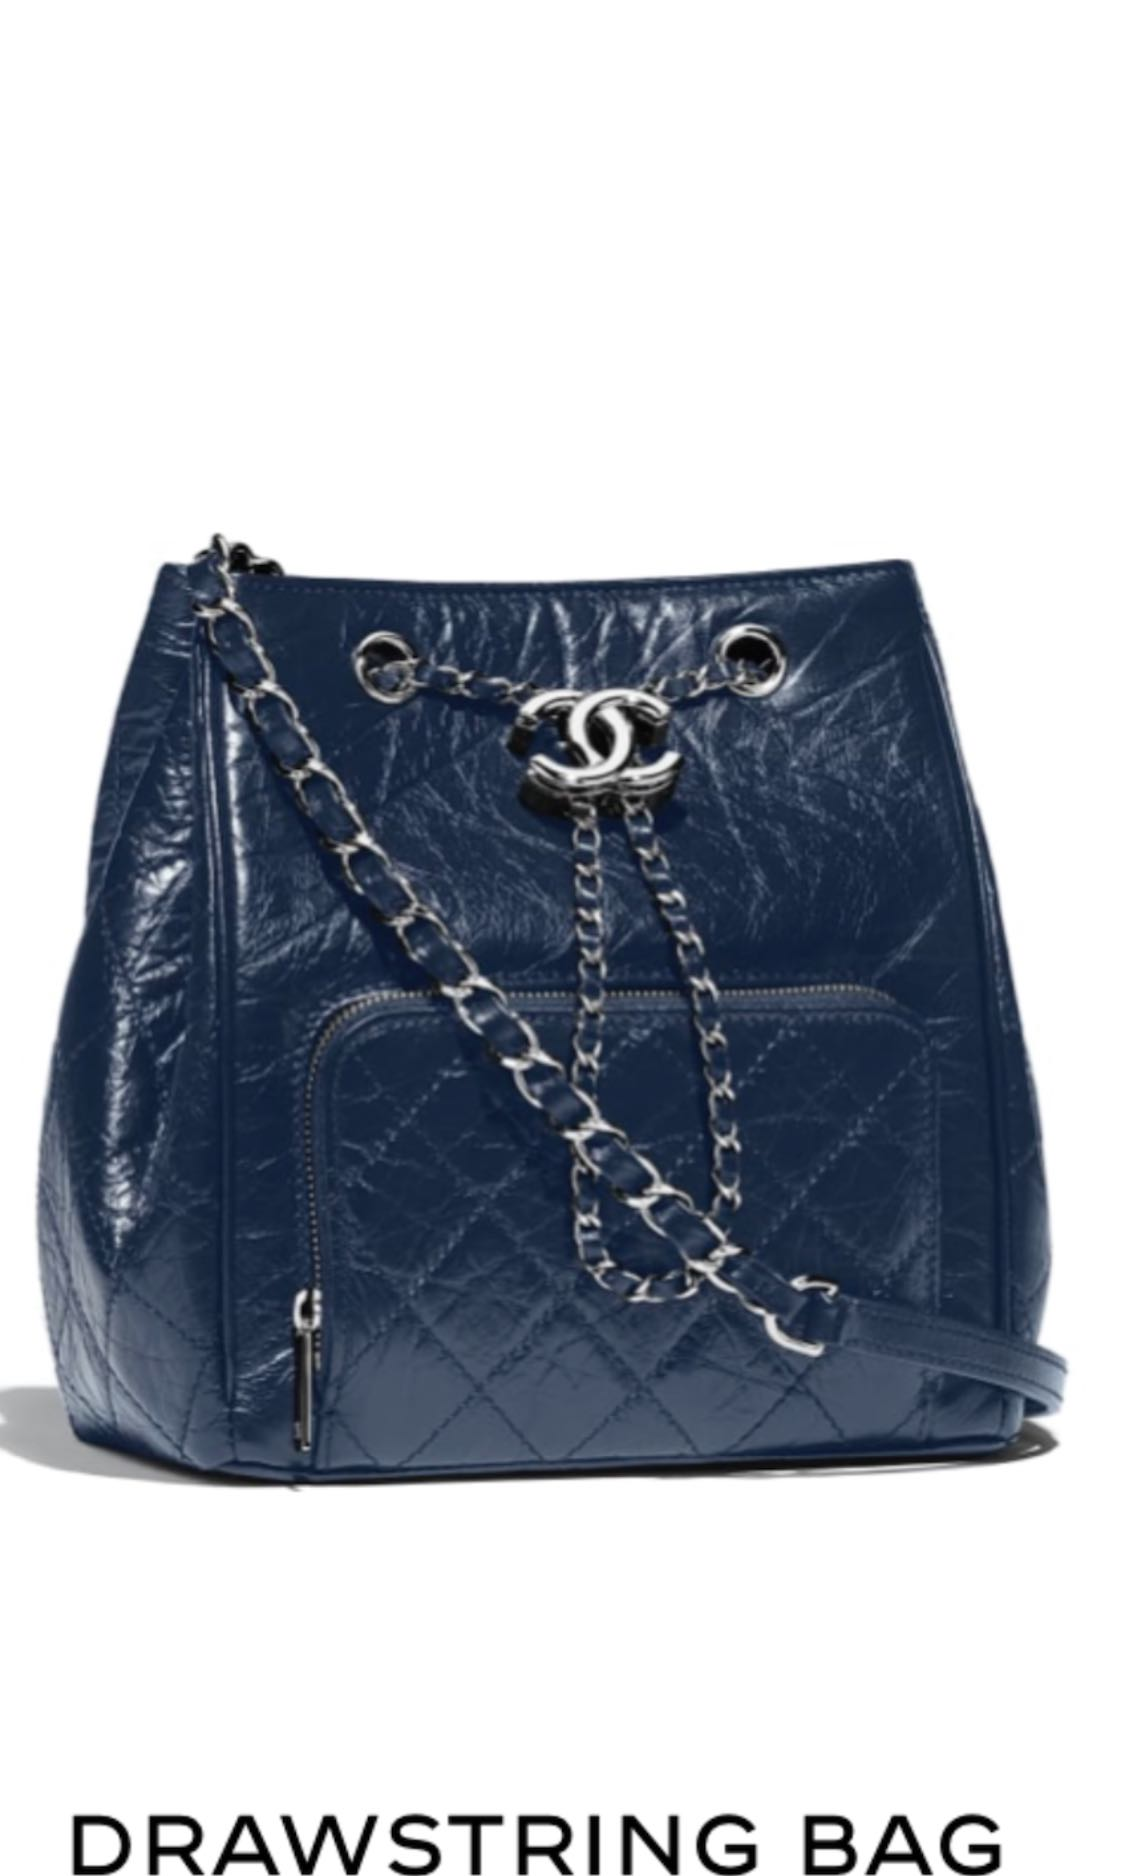 44ca76a6cce5 BN Chanel Drawstring Bag